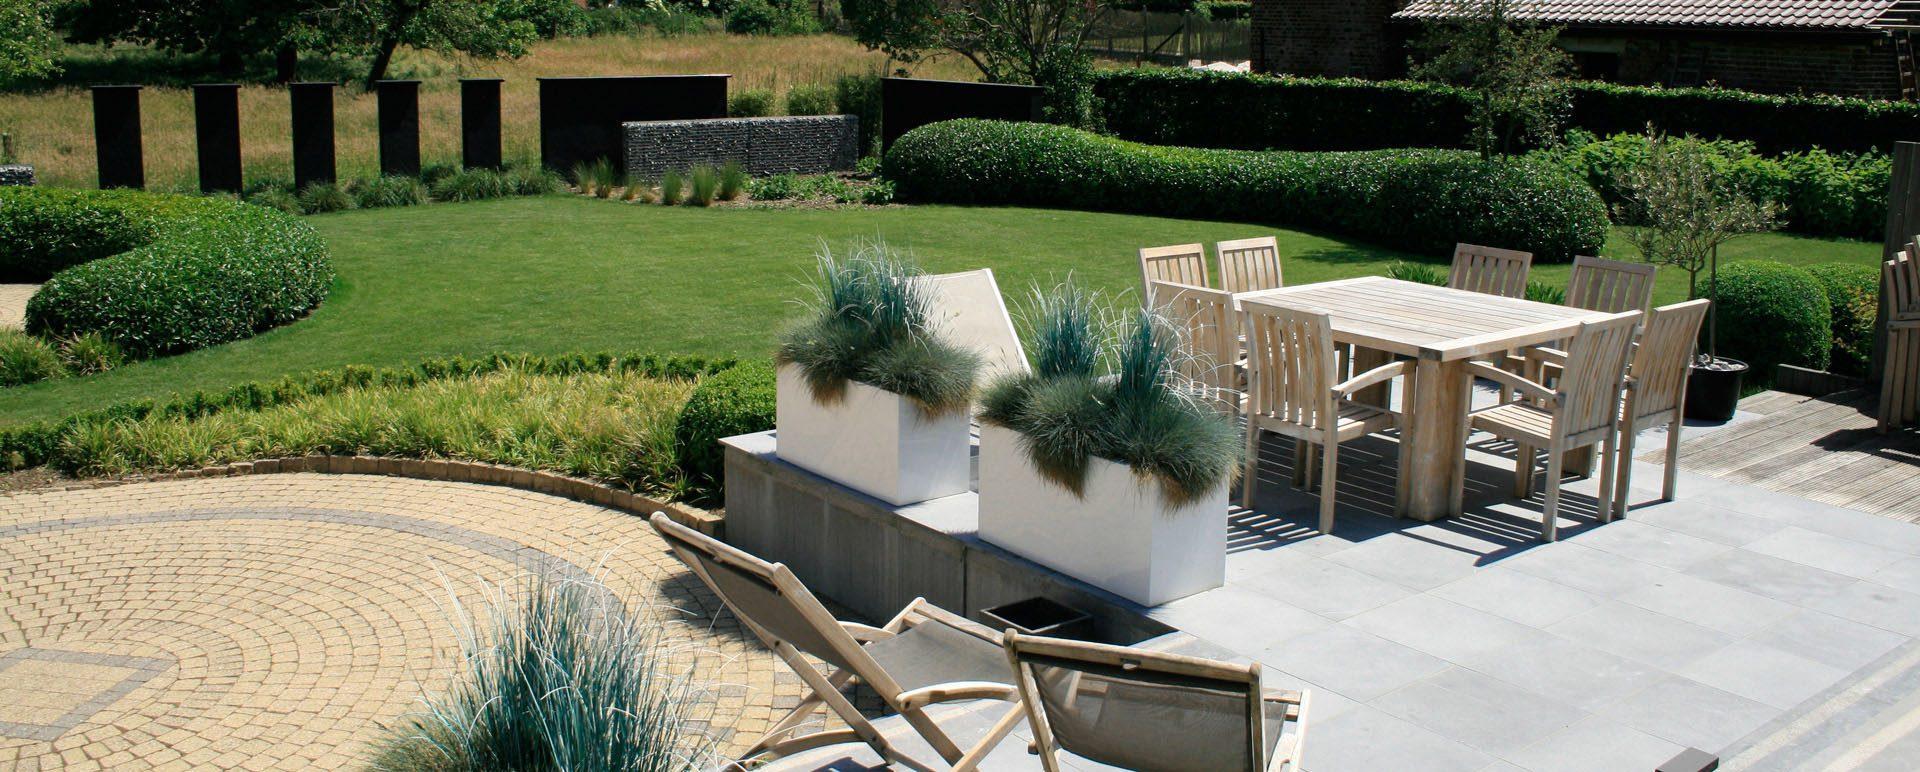 Hedendaagse tuinen - Tuinconcept Mertens